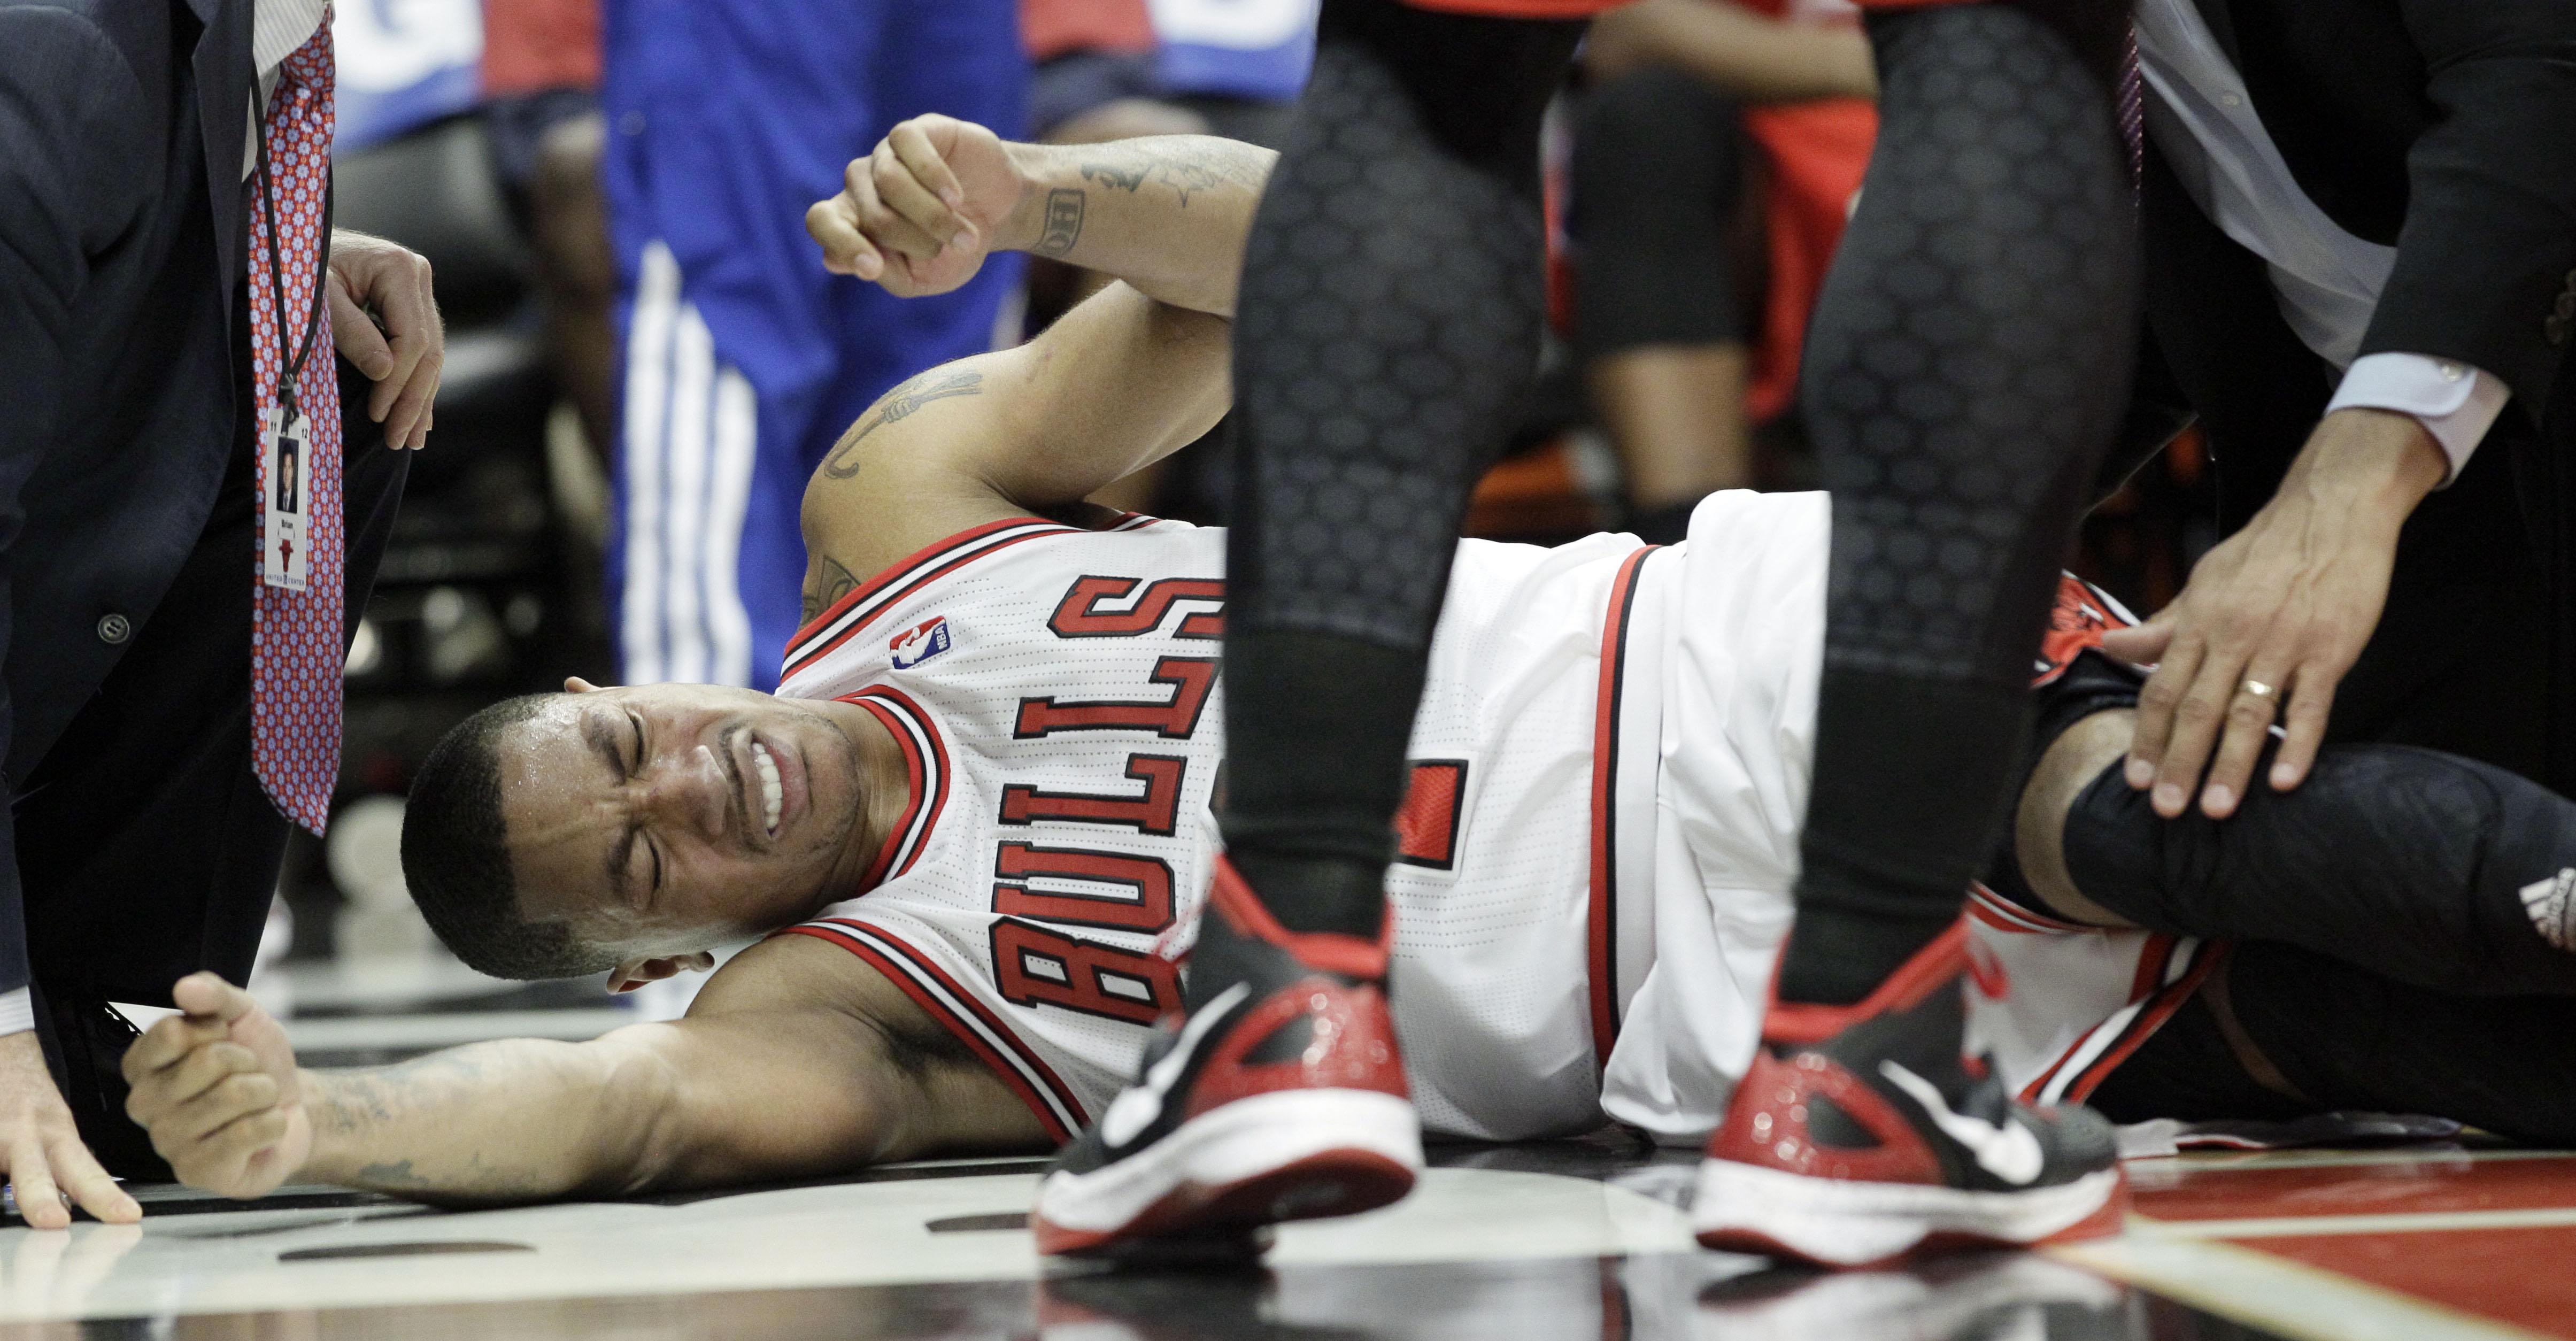 11db12f6ed8 Nike shoe designer apologizes for mocking Derrick Rose after injury ...